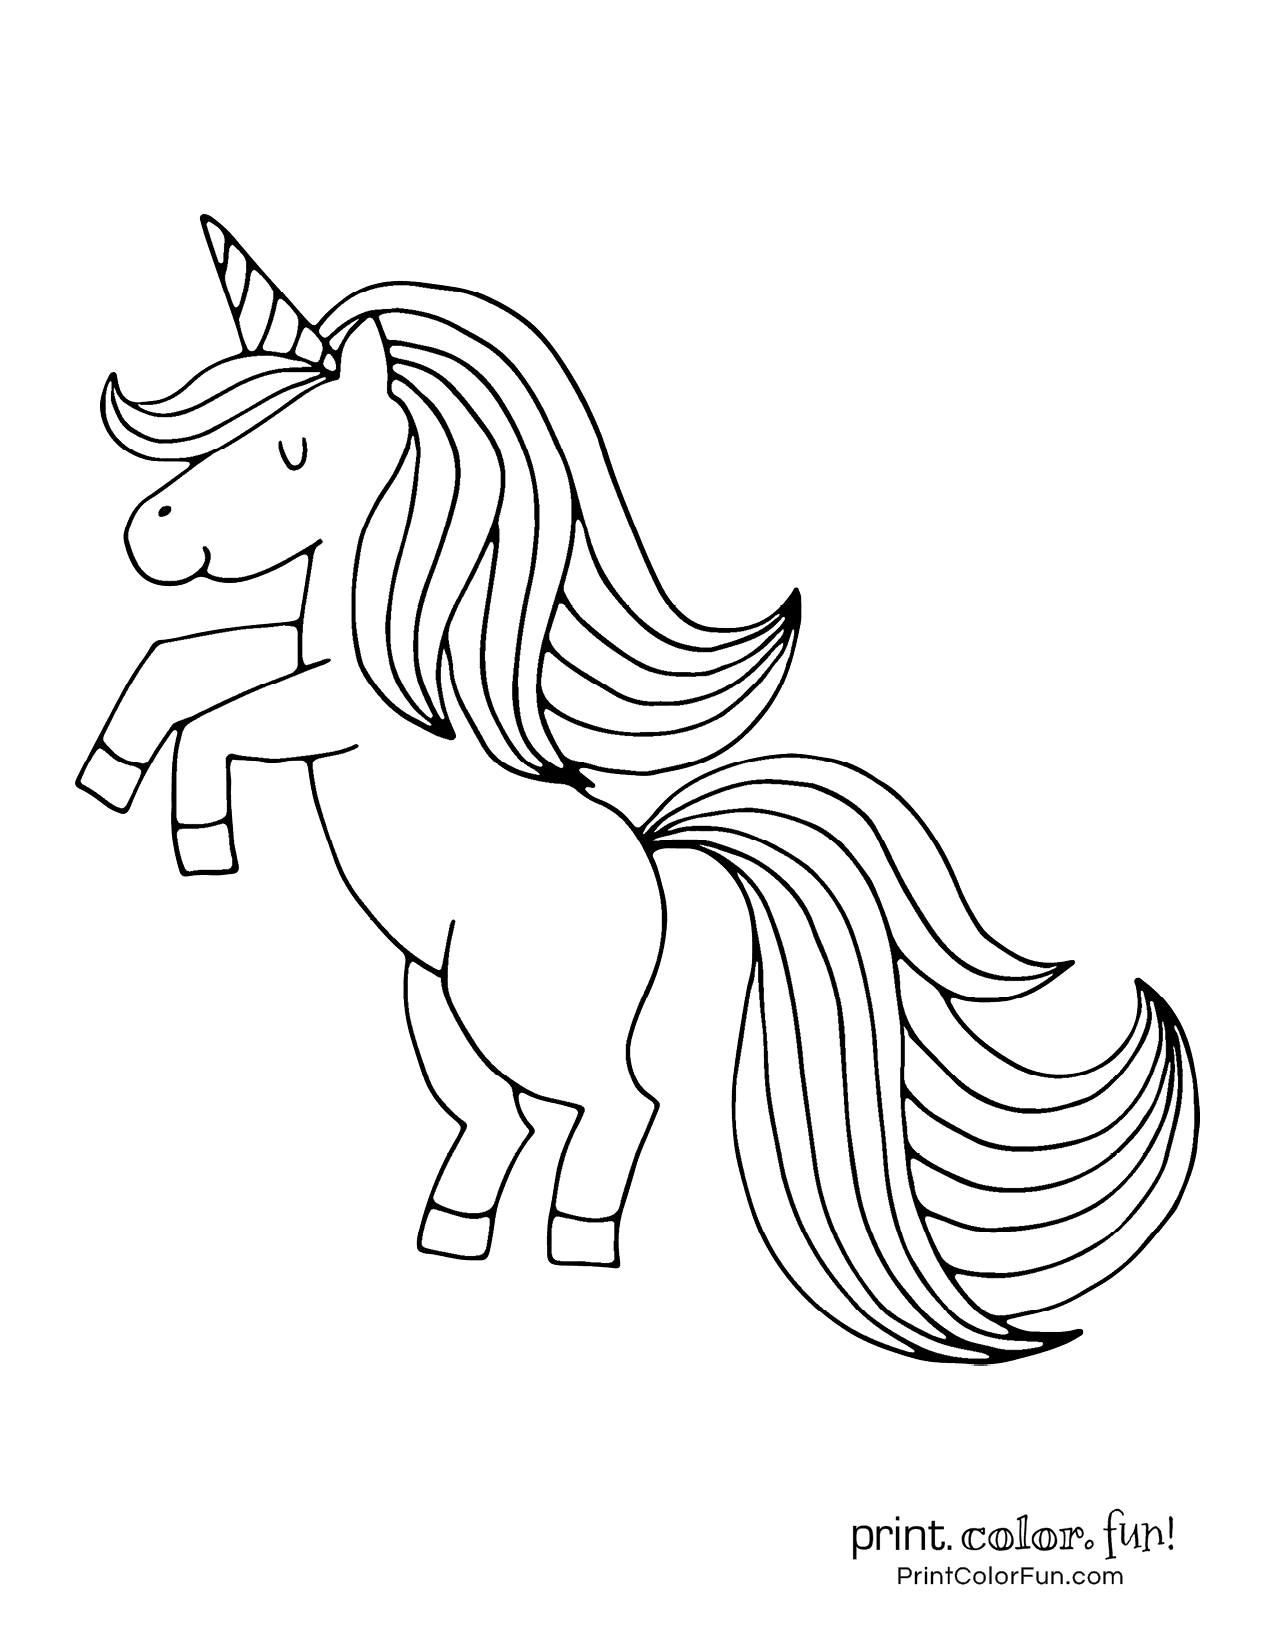 Free Printable Unicorn Seahorse Pdf Coloring Page Unicorn Coloring Pages Free Printable Coloring Sheets Printables Free Kids